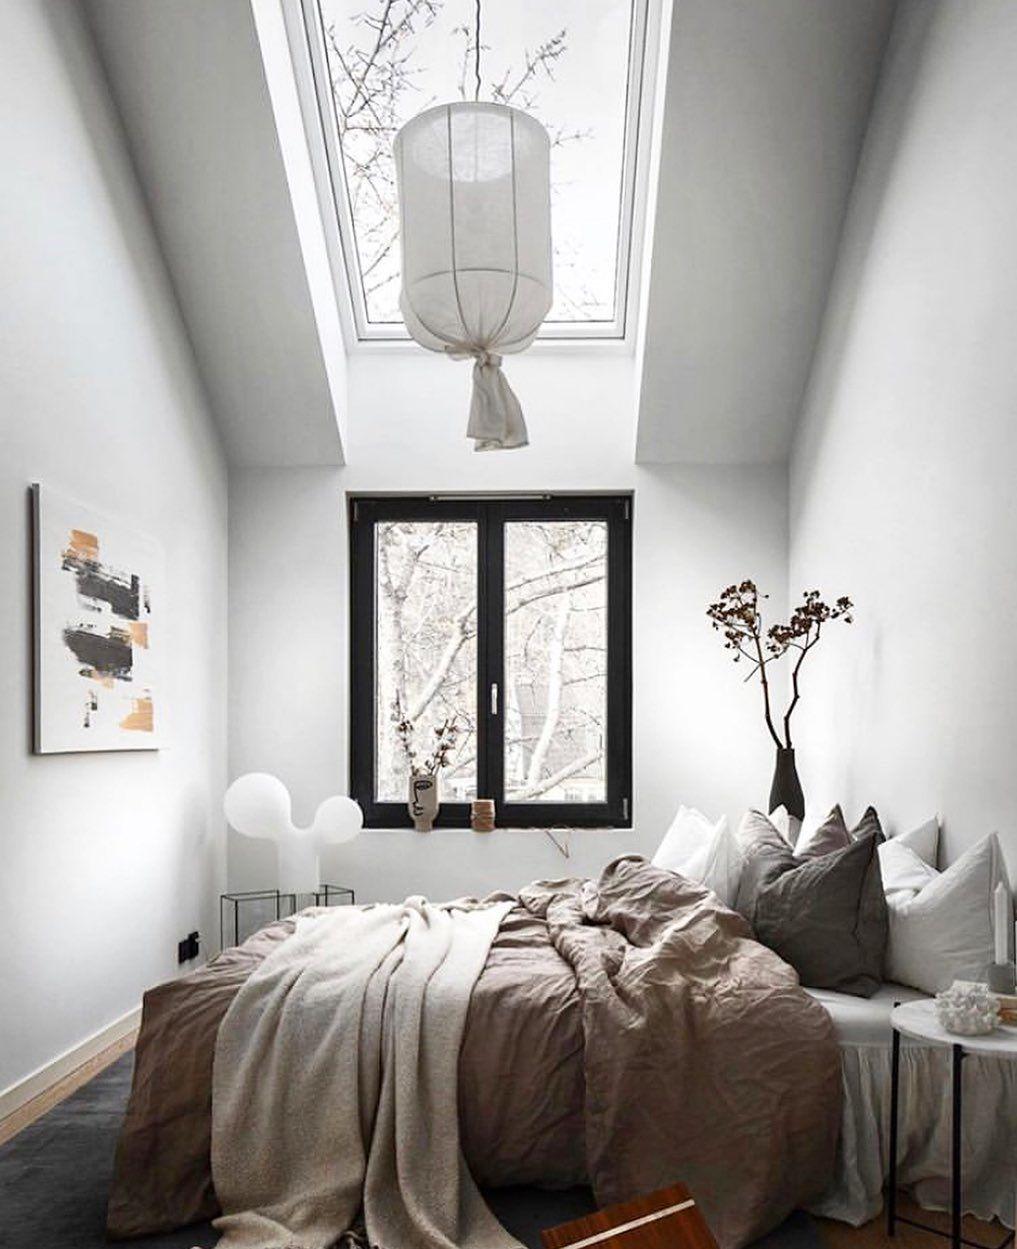 Lonny On Instagram On Saturdays We Sleep In It S A Mood Via Scandinavianhomes Photography Via Nordikspace Bedroom Interior Home Decor Home Cool bedroom ideas lonny